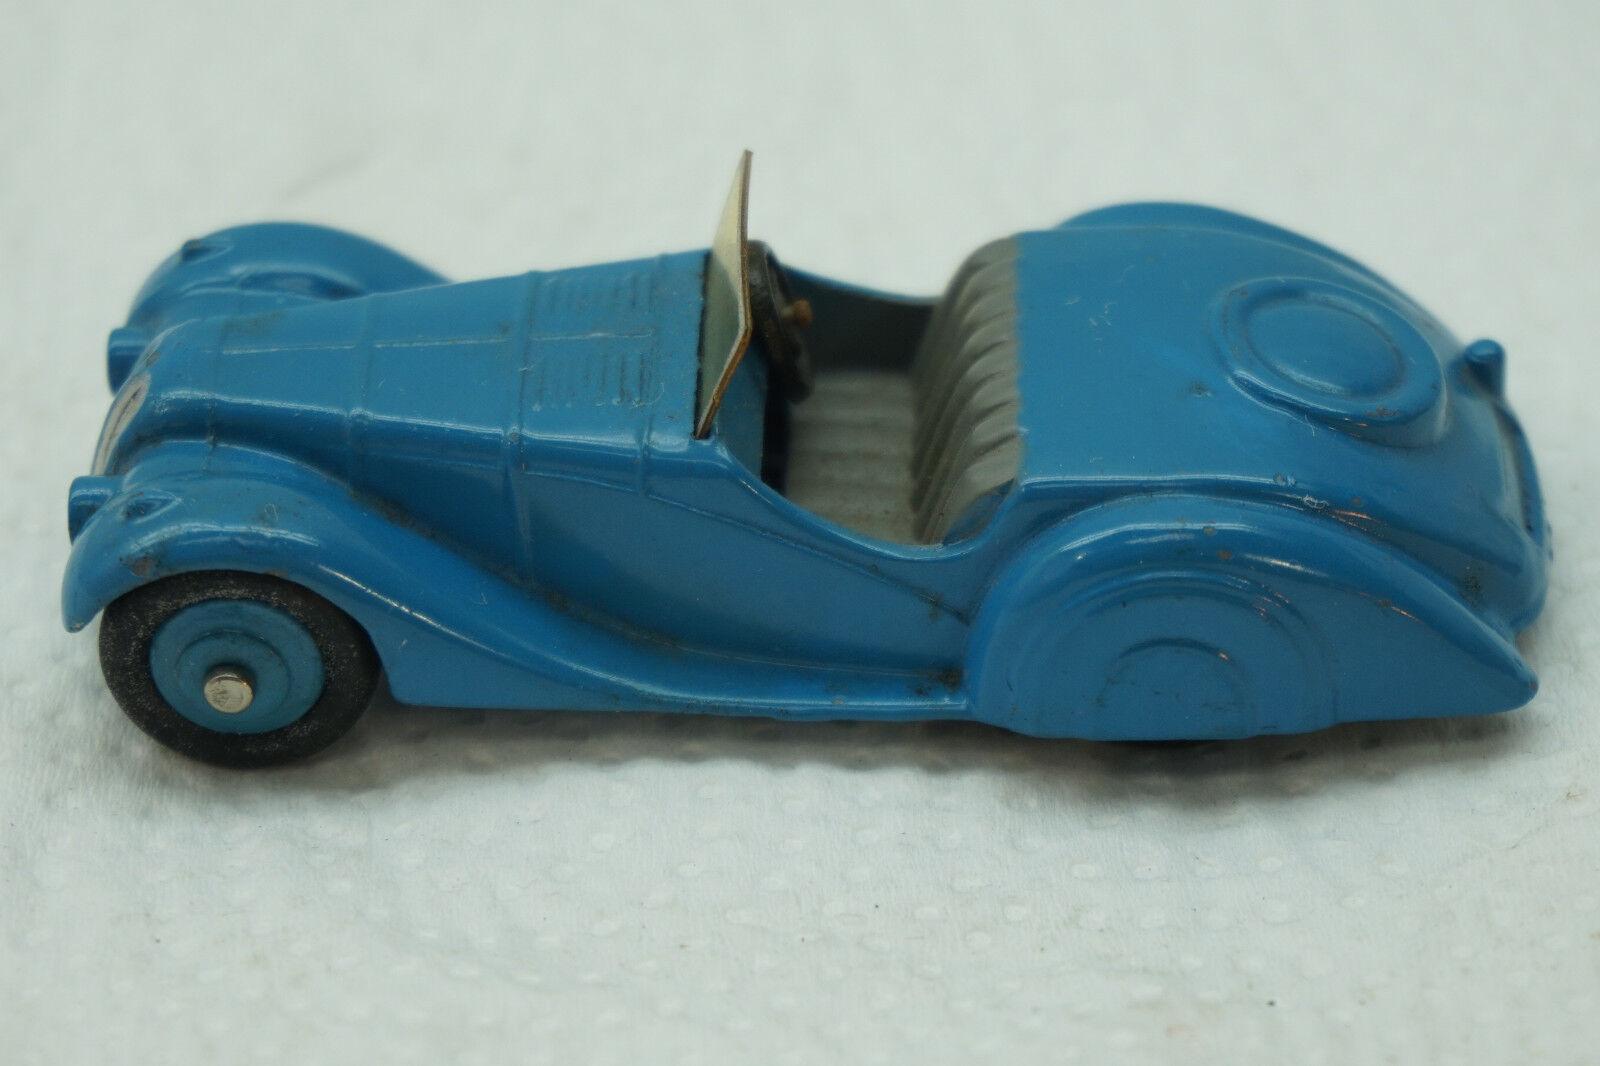 Auto de juguete Retro - clásico frazienaresh 38a converdeidor de parabrisas de plástico azul